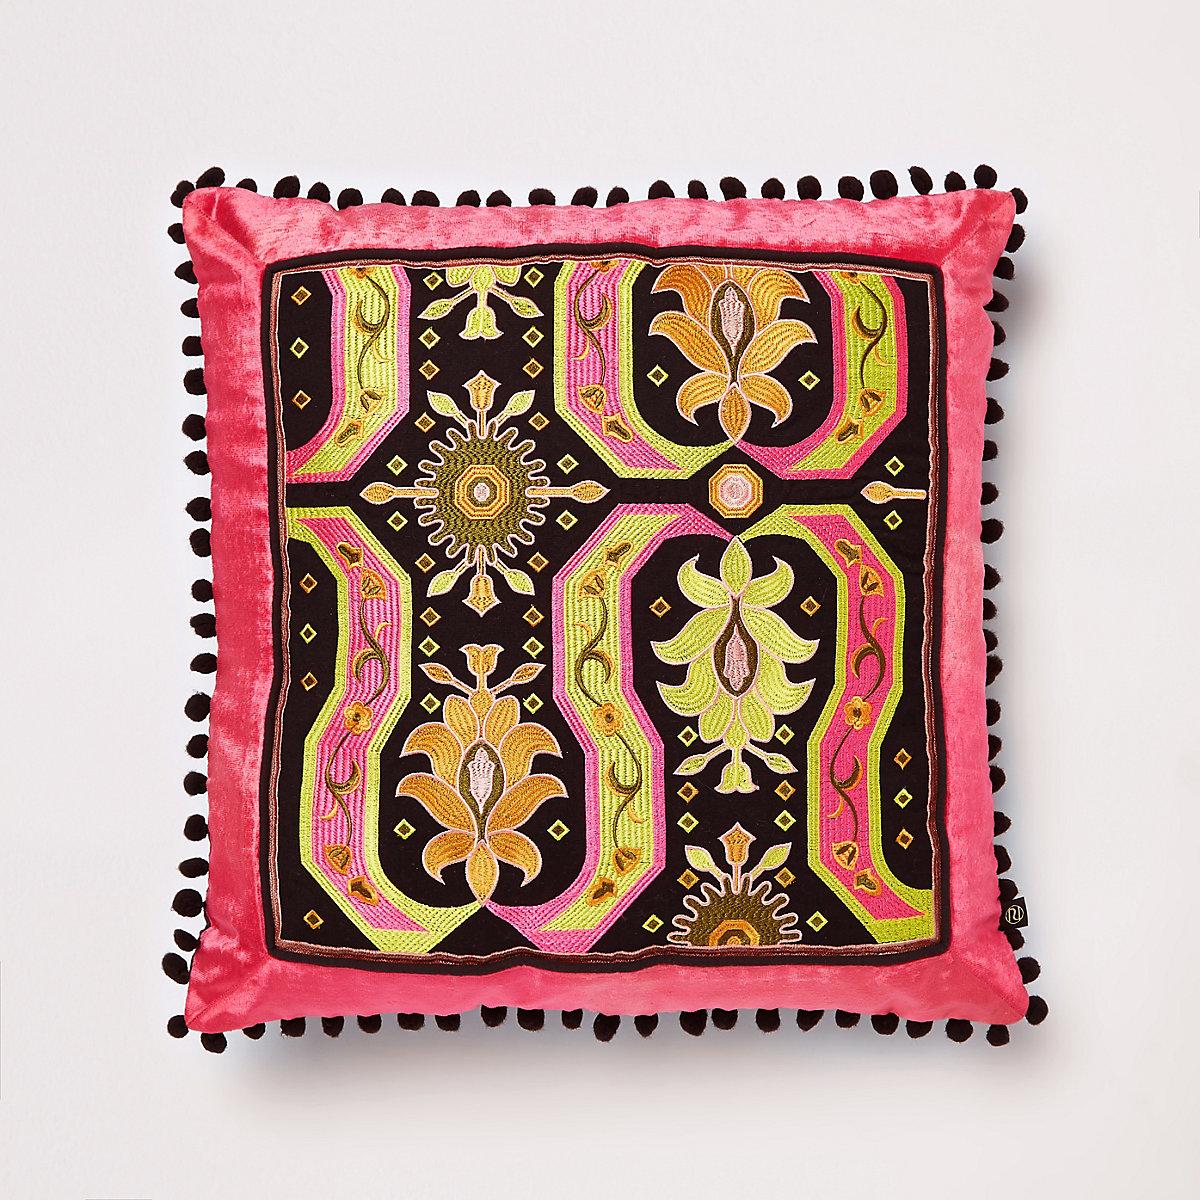 Pink embroidered velvet cushion